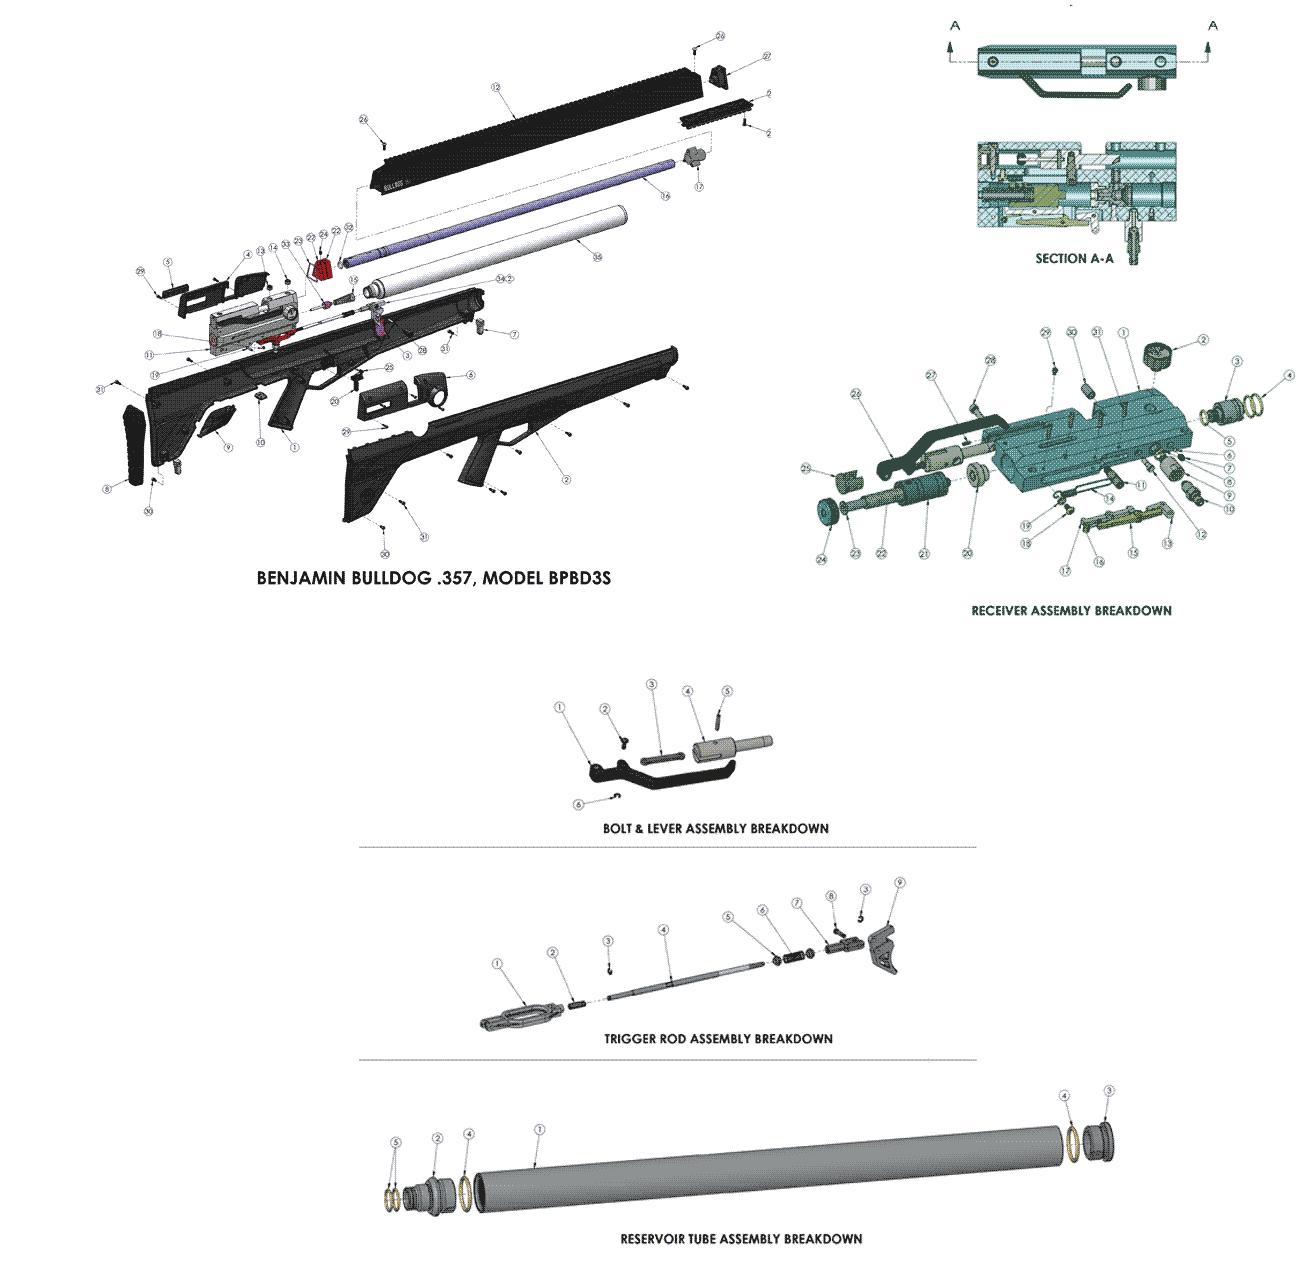 Product Schematics For Benjamin Bulldog 357 Bullpup Shrouded